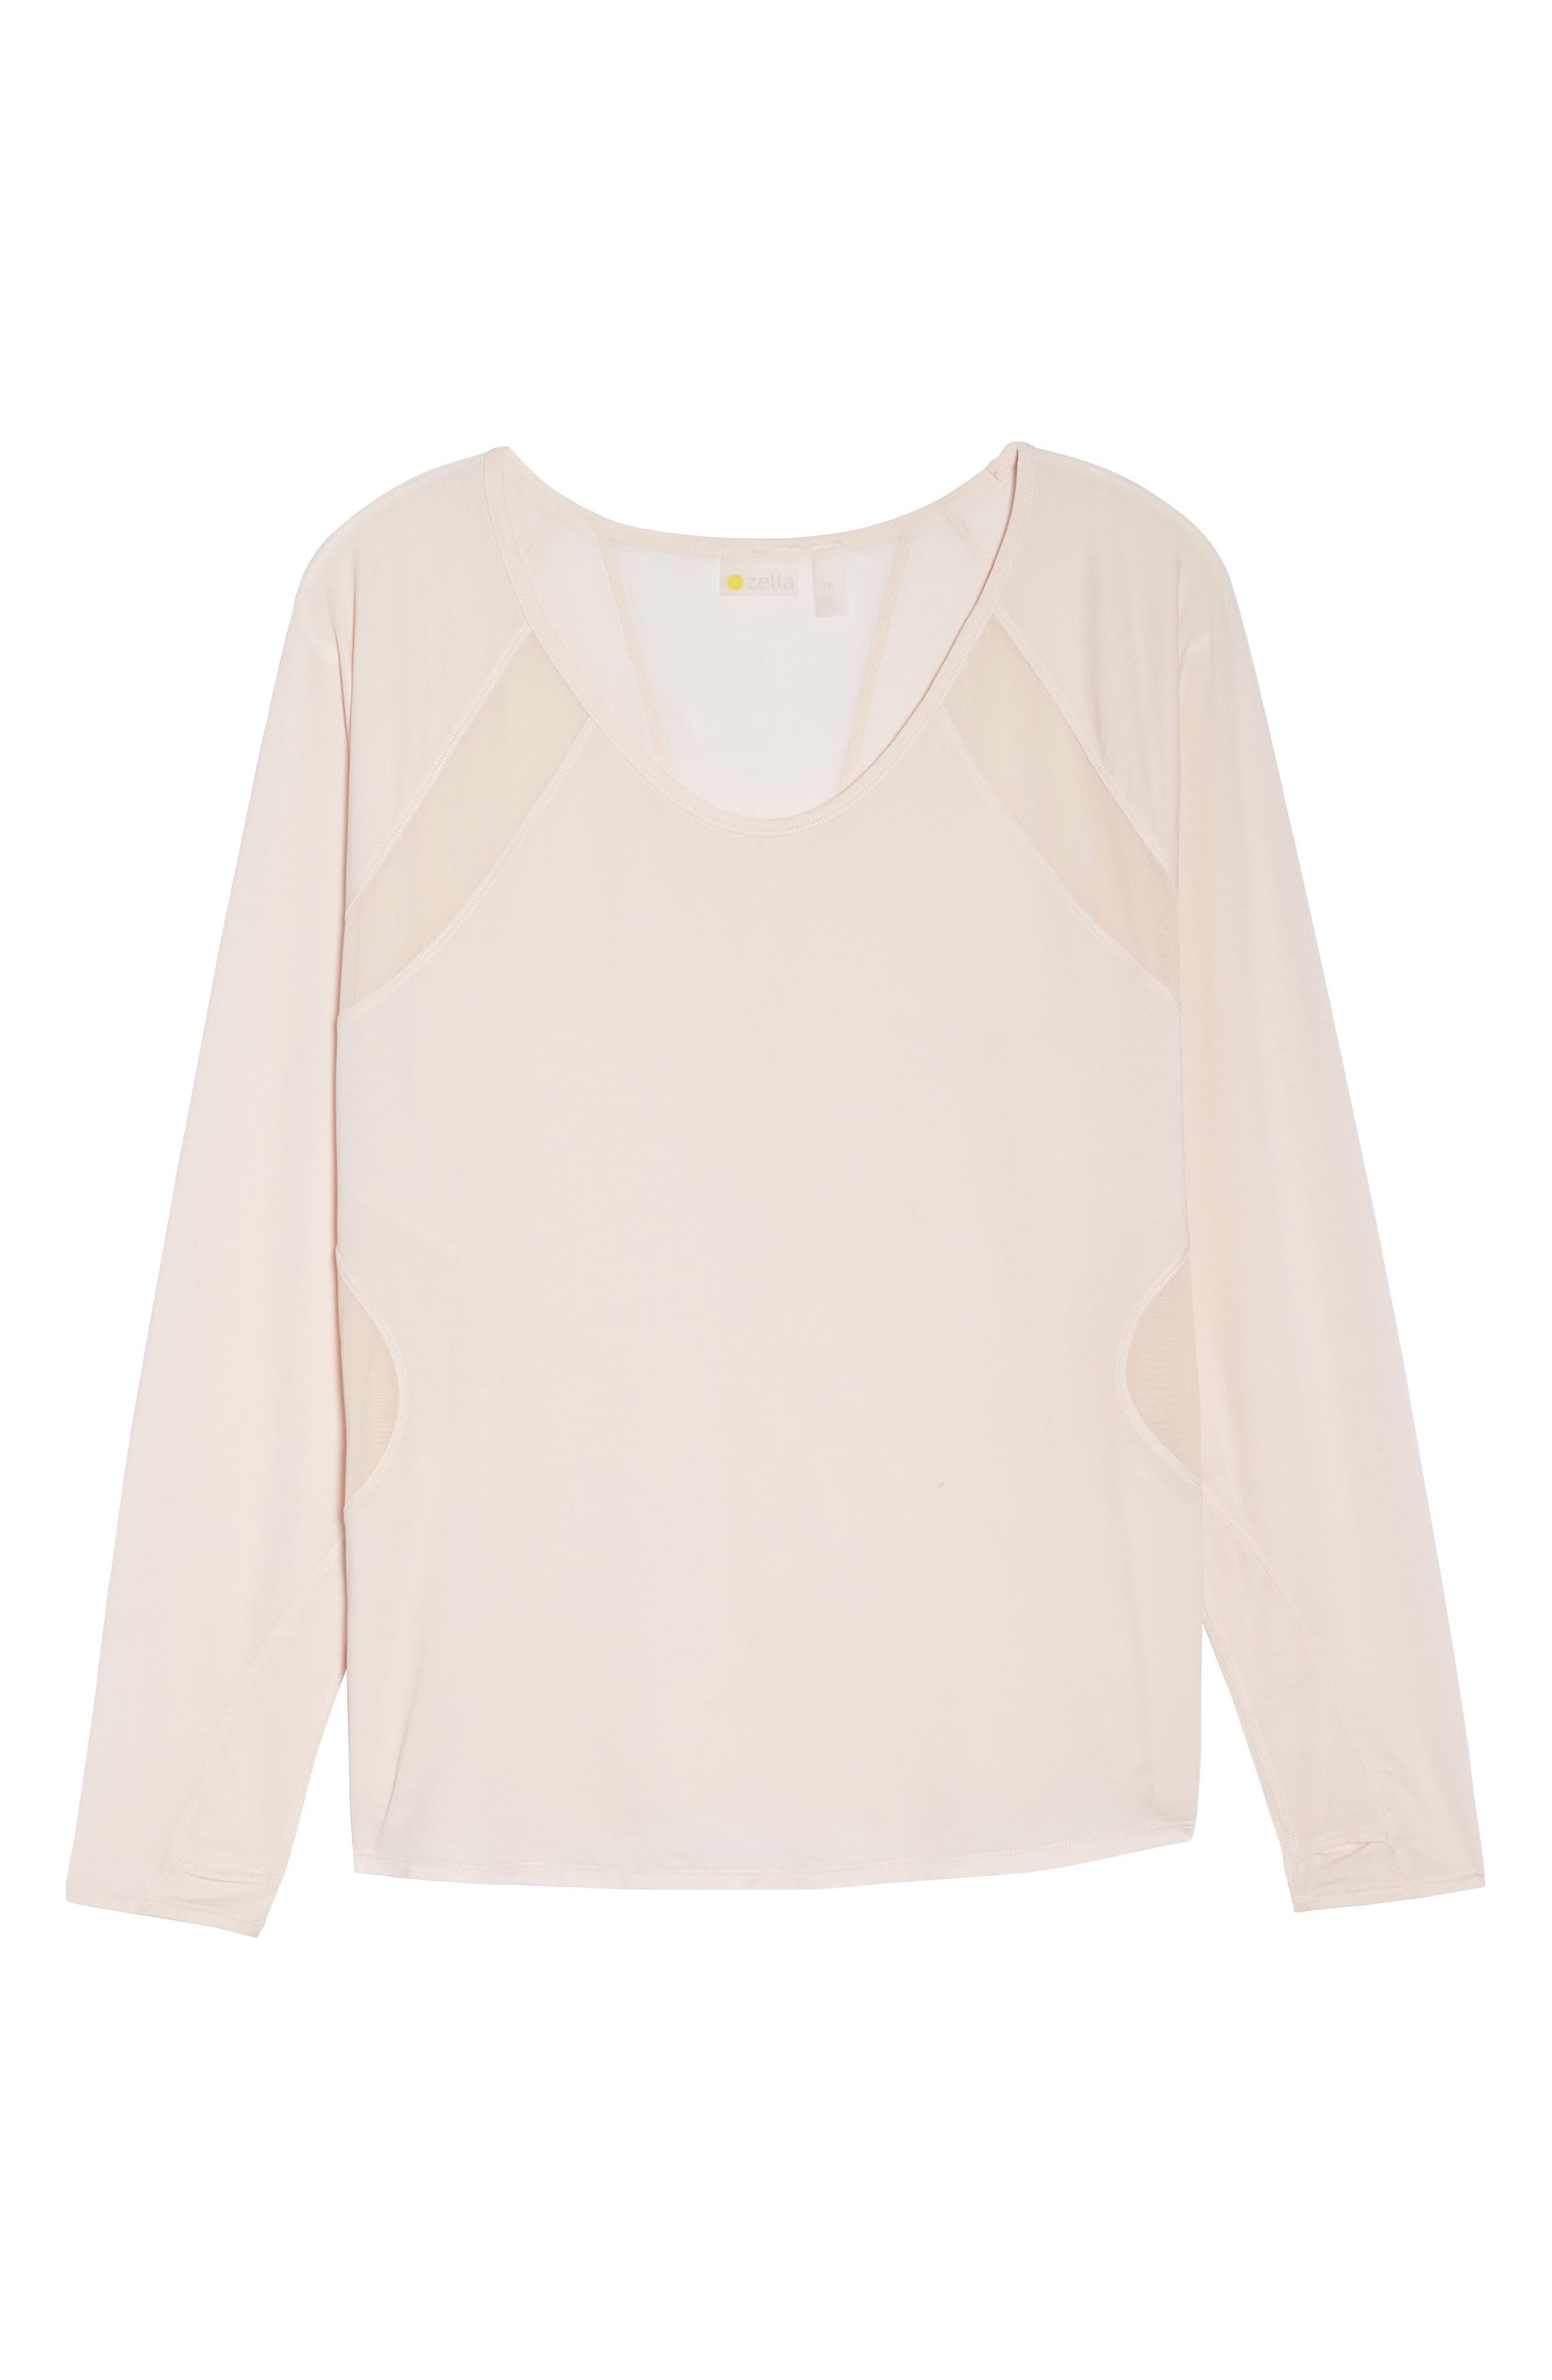 Contour 2 Pullover Top,                             Alternate thumbnail 7, color,                             Pink Morganite